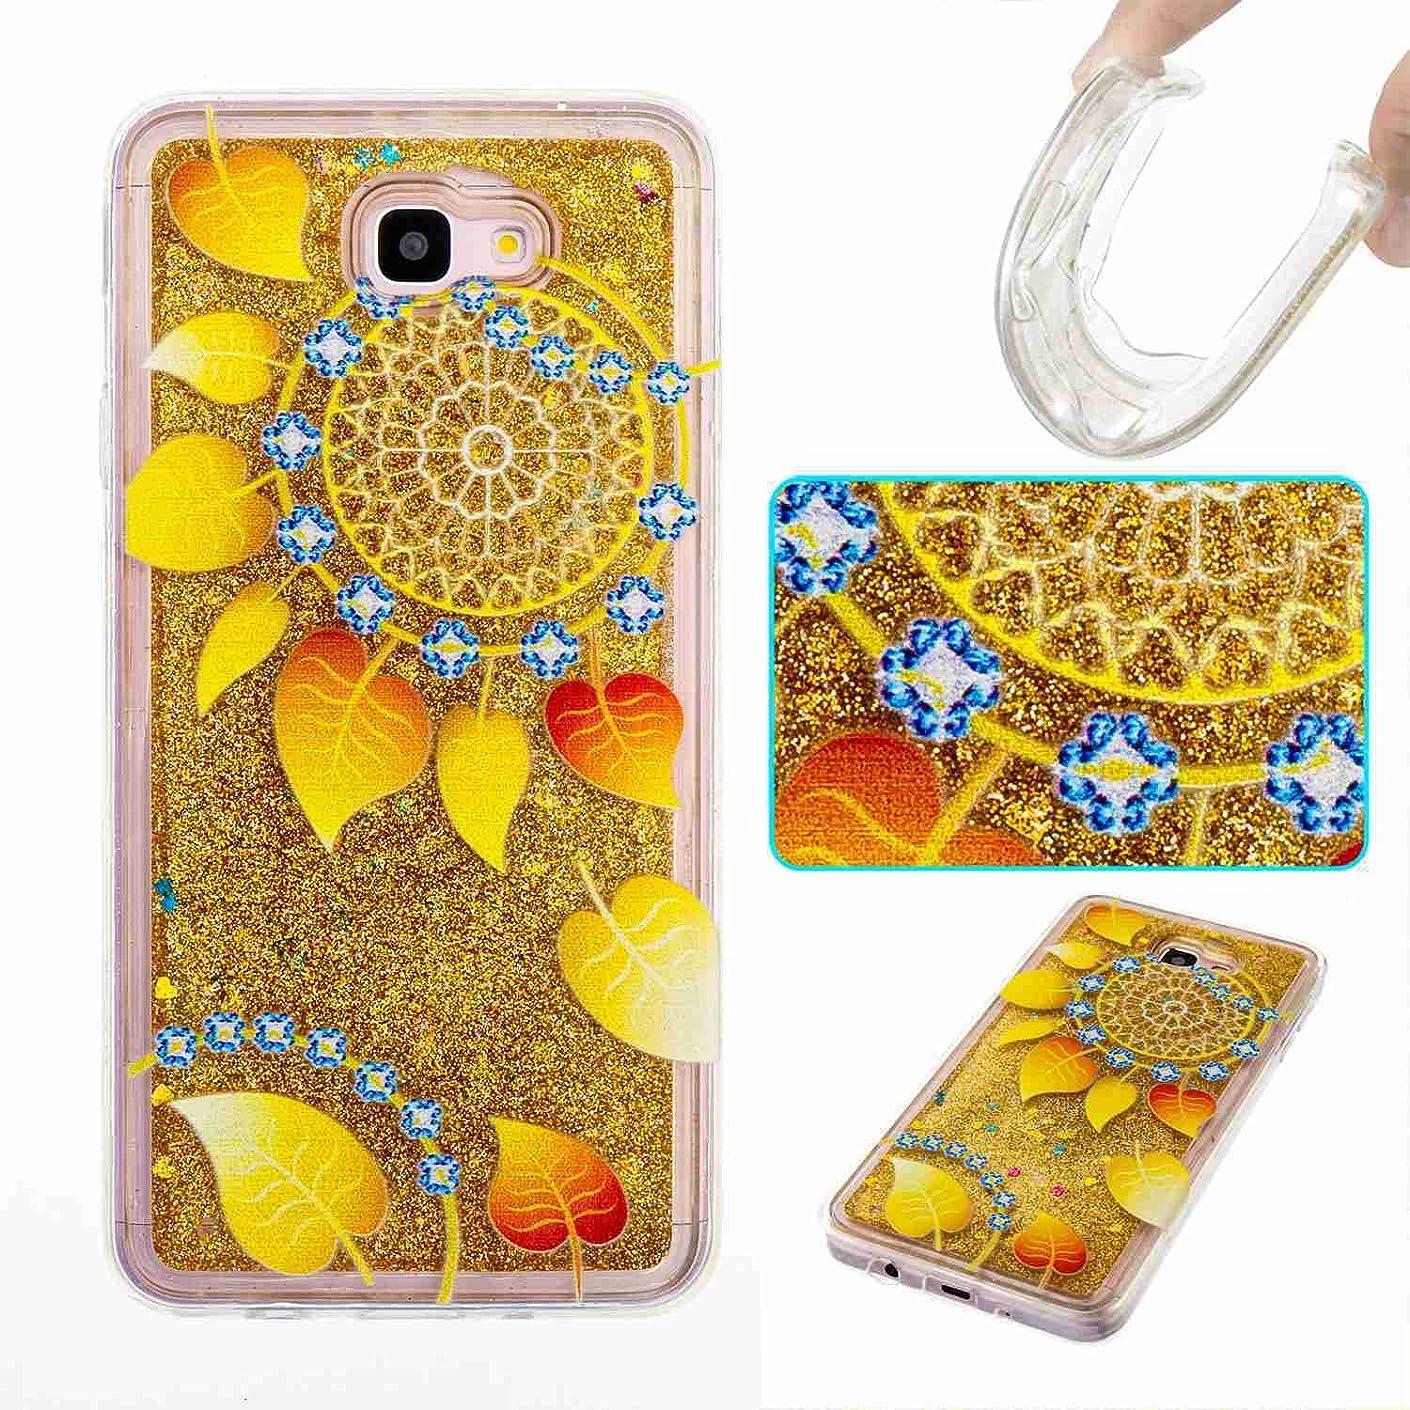 Samsung Galaxy J7 V Case/Galaxy J7 Perx Case/Galaxy J7 Sky Pro / J7 Prime/Galaxy Halo / J7 2017 Case, UZER Bling Quicksand Moving Flowing Floating Twinkle Glitter Shining Sparkle Liquid Case